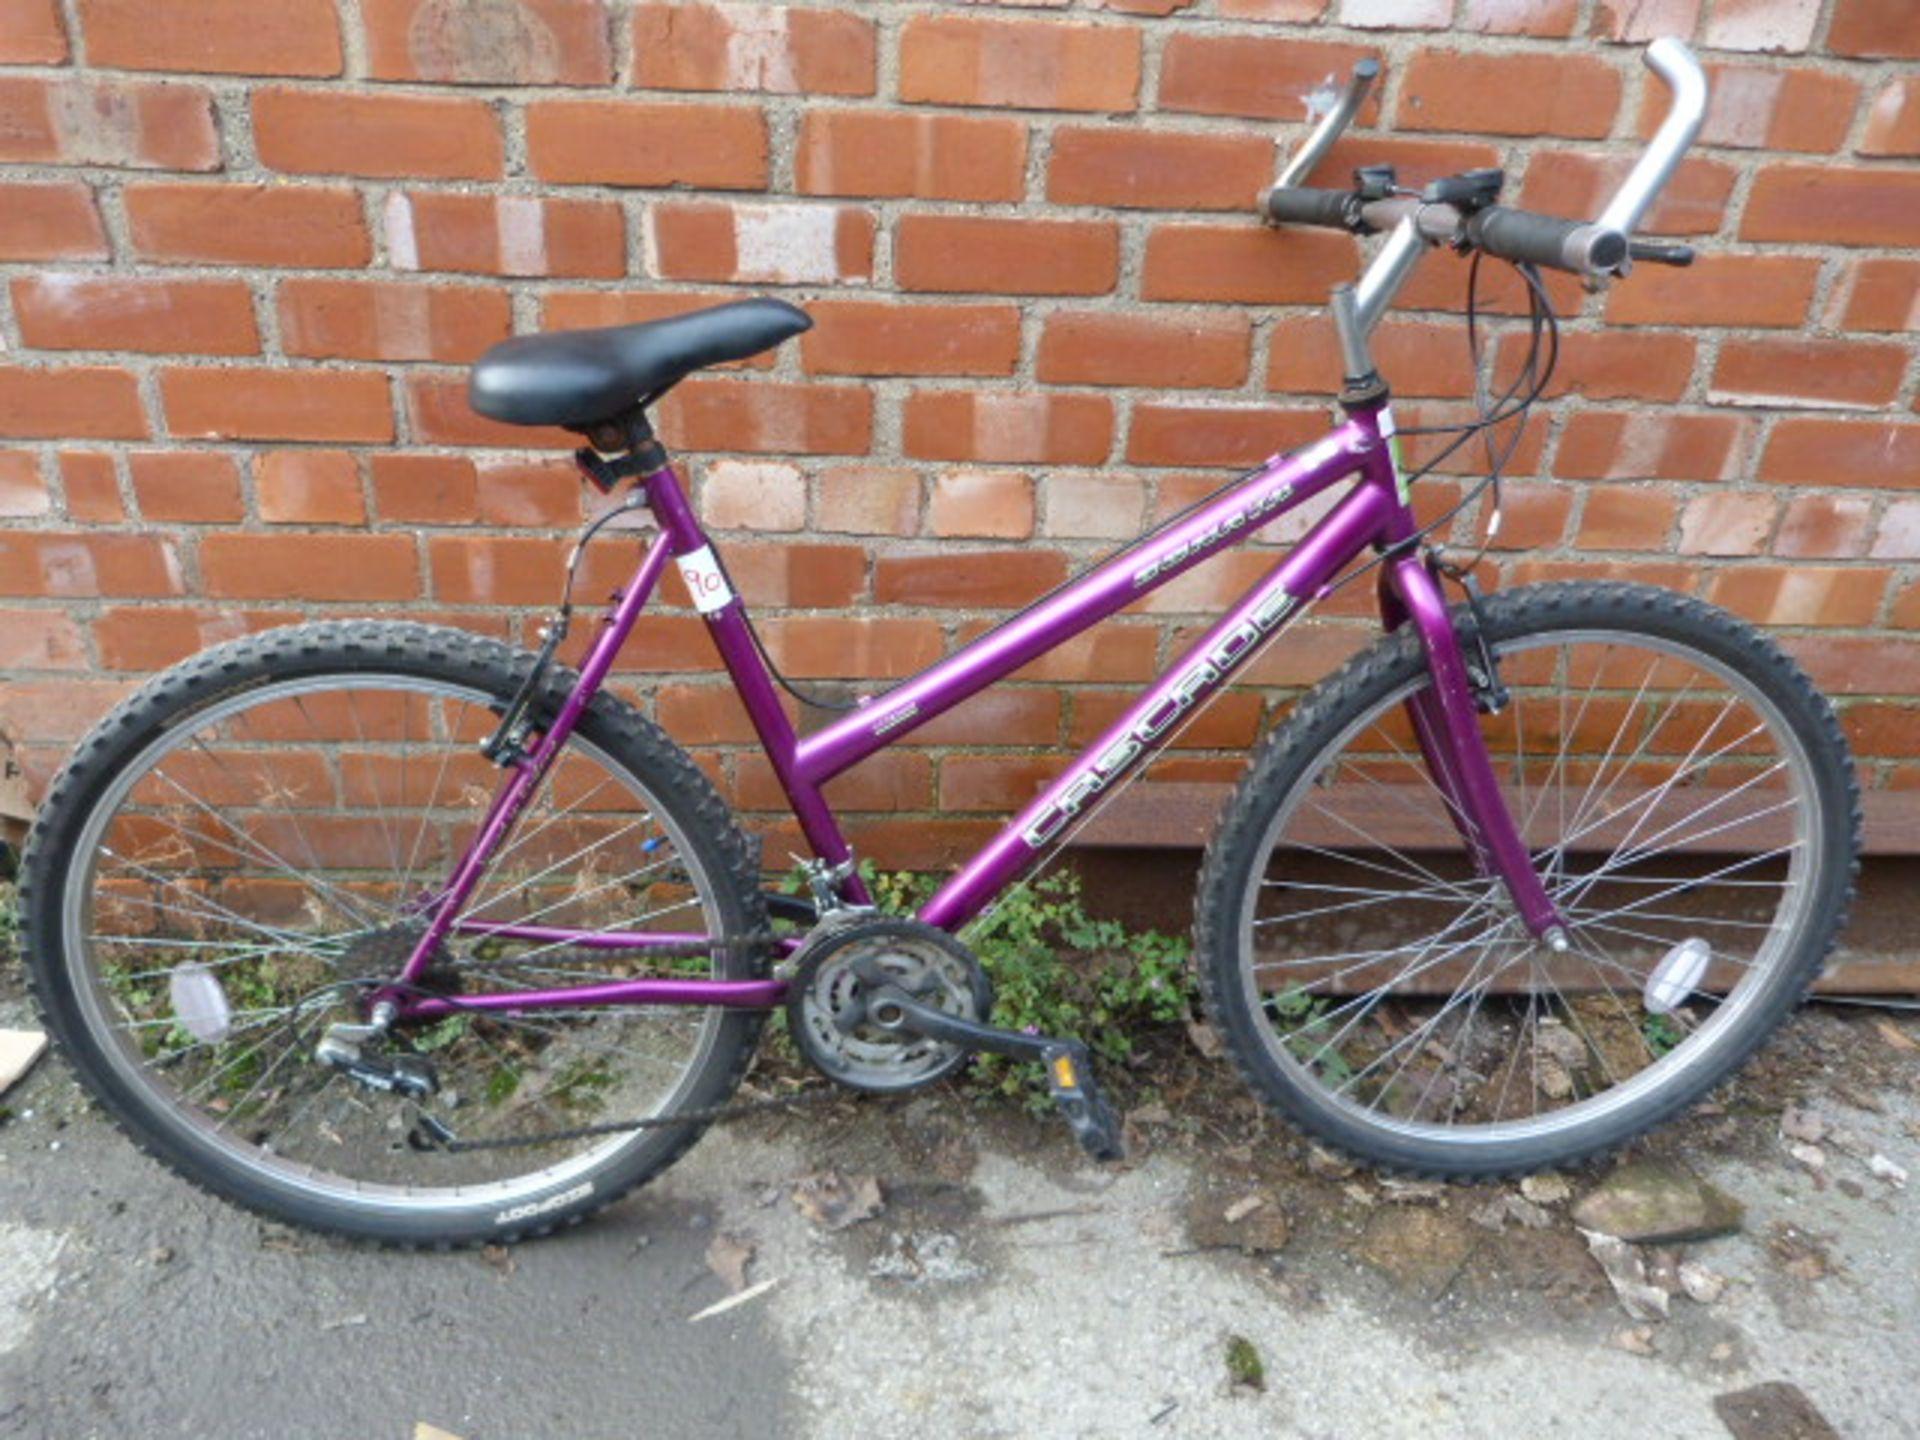 Lot 8 - Sonata Cascade Bicycle